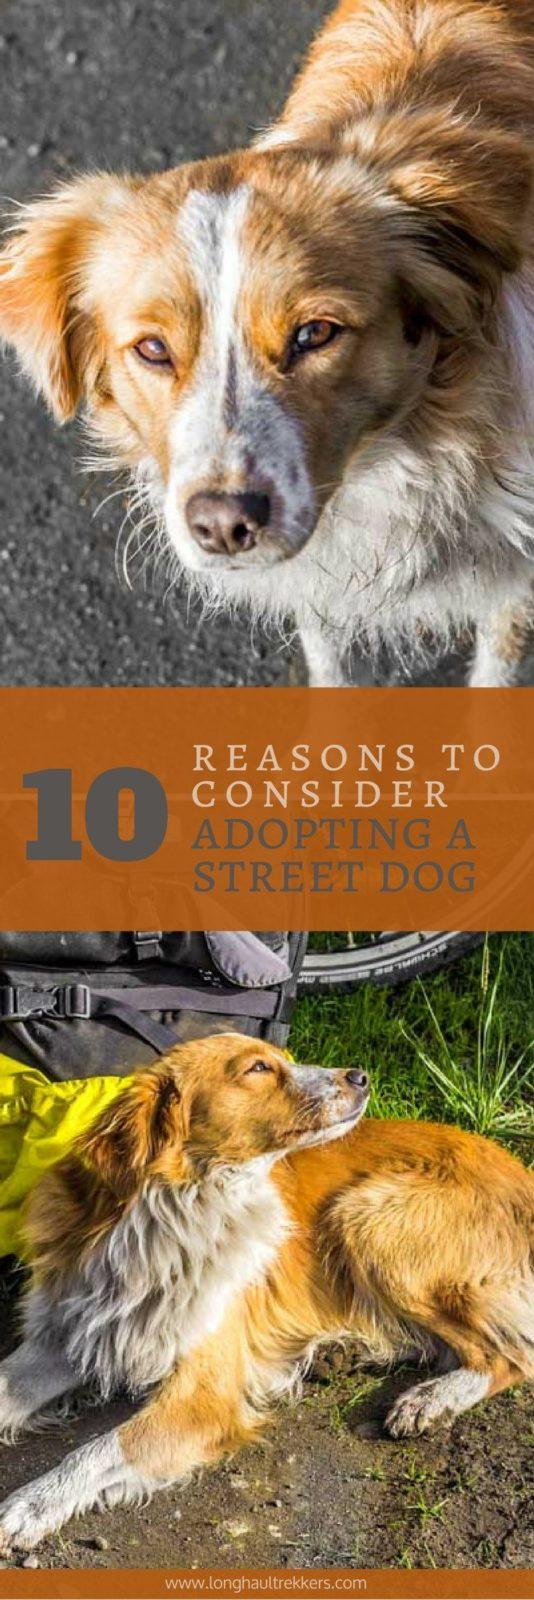 10 Reasons to Consider Adopting a Street Dog | Long Haul Trekkers